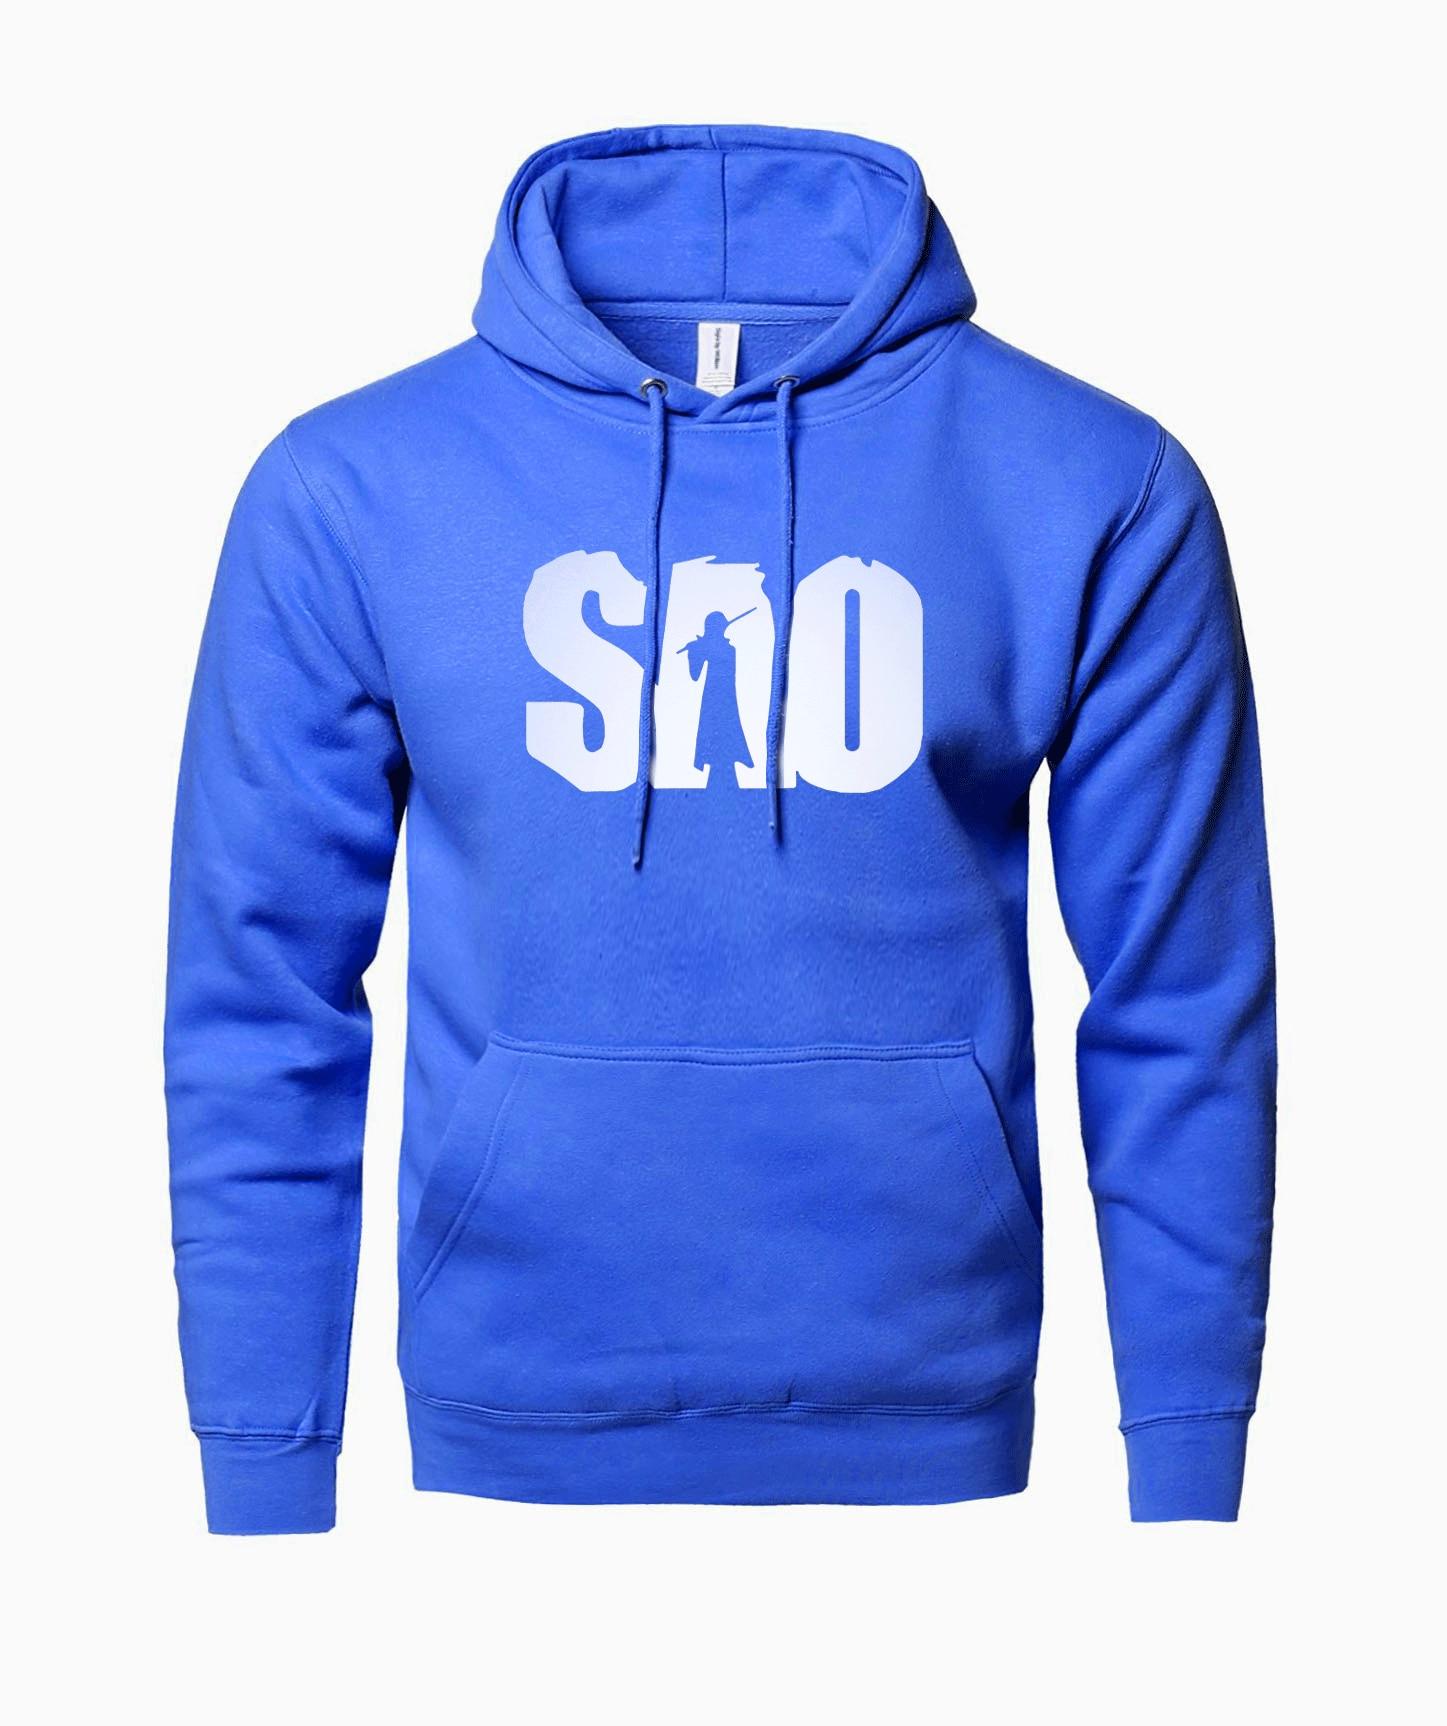 hot sale Anime S.A.O sweatshirts men 2018 spring winter new Sword Art Online hoodies men fleece fashion harajuku men hoodie